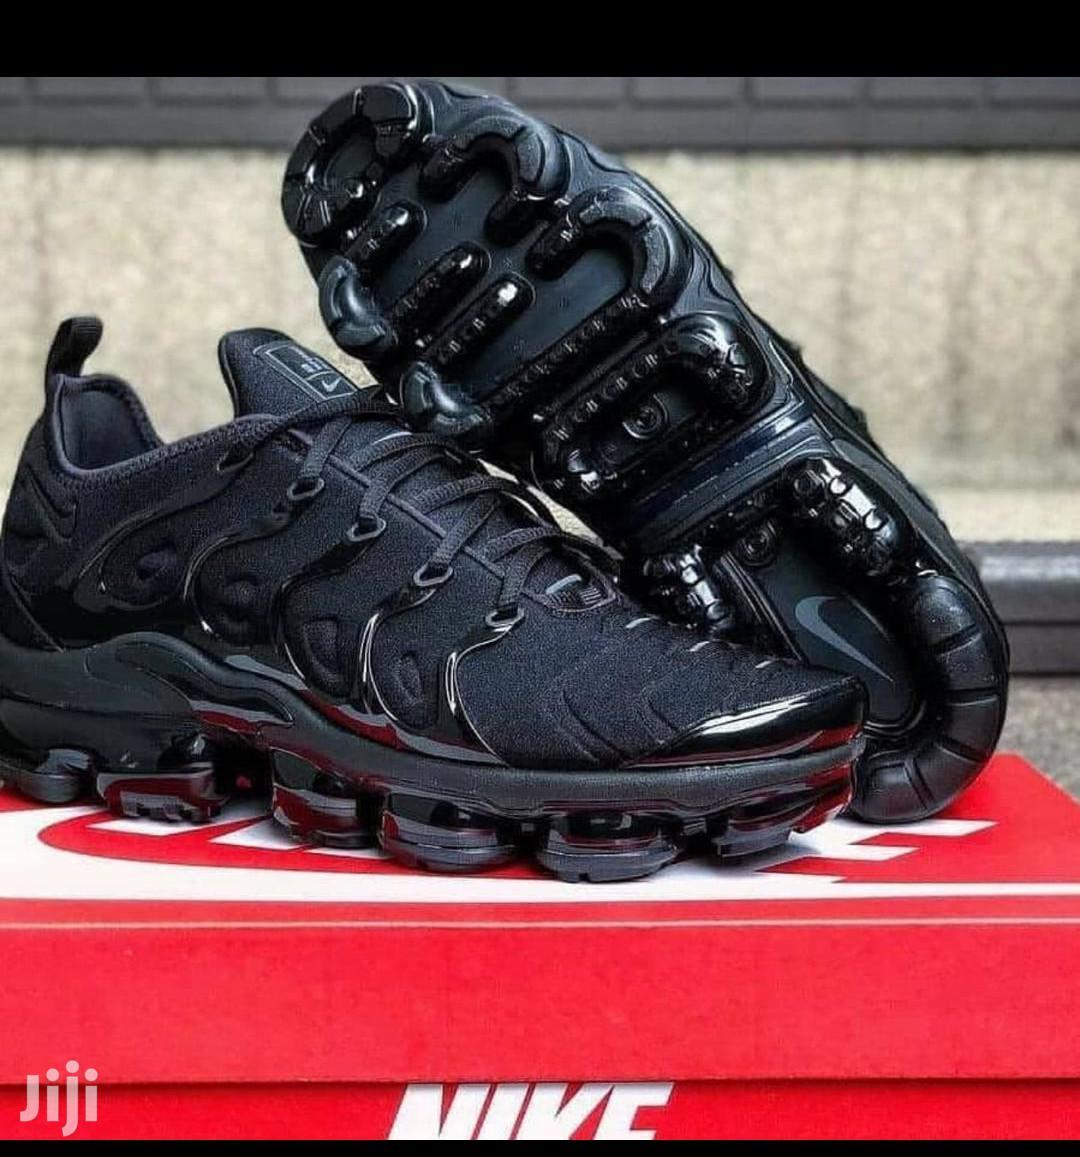 Nike Airmax Black Sneakers